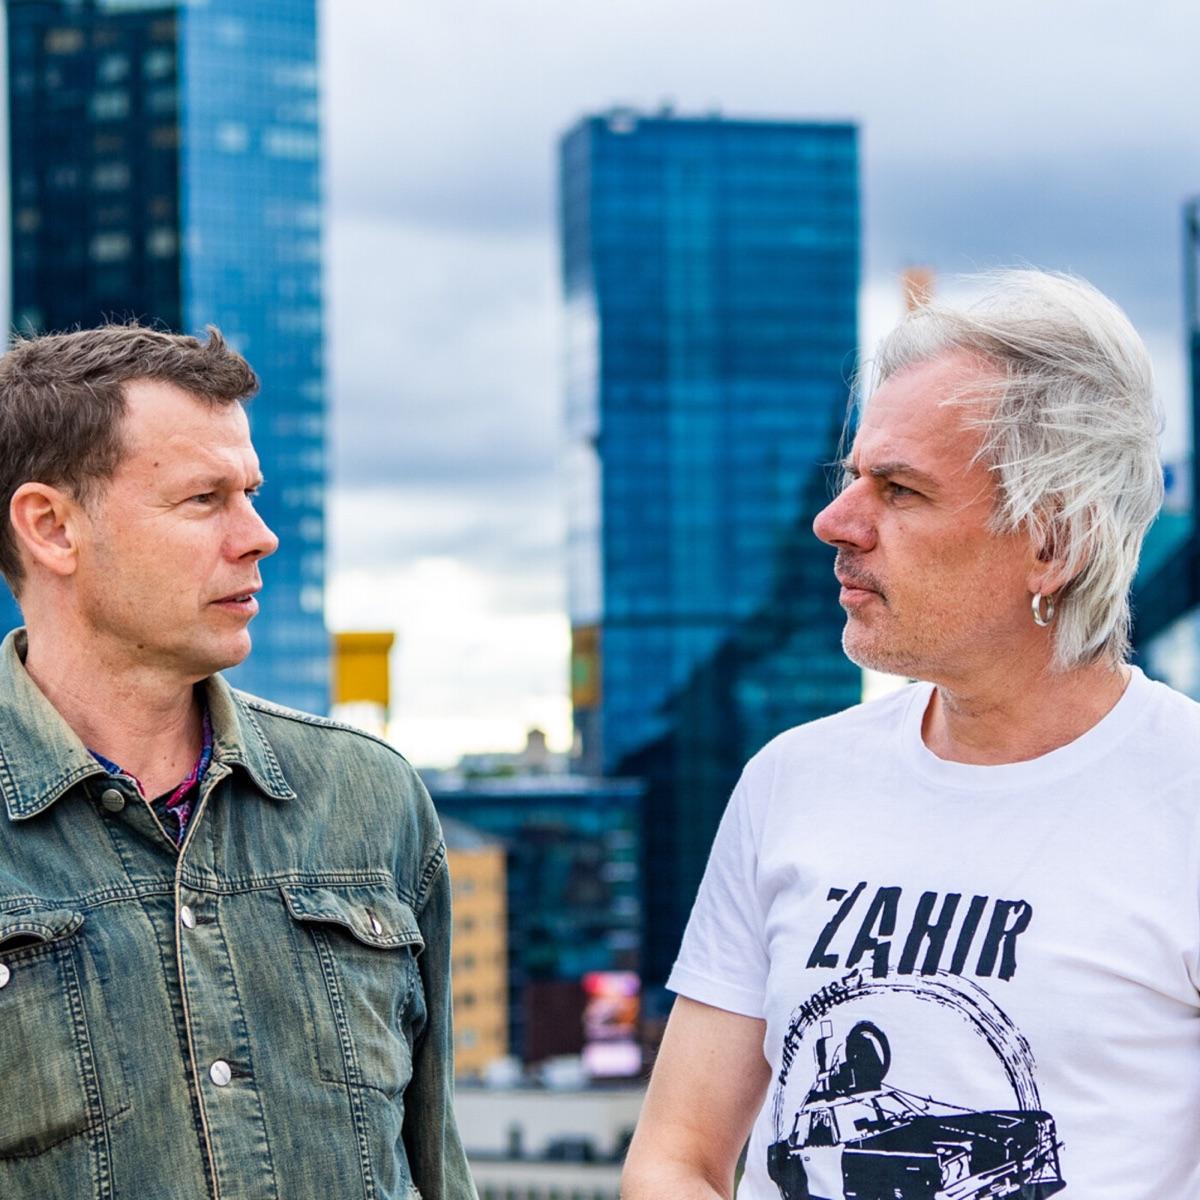 Nädal muusikas 07.10.2020. Aivar Meos & Lennart Beat